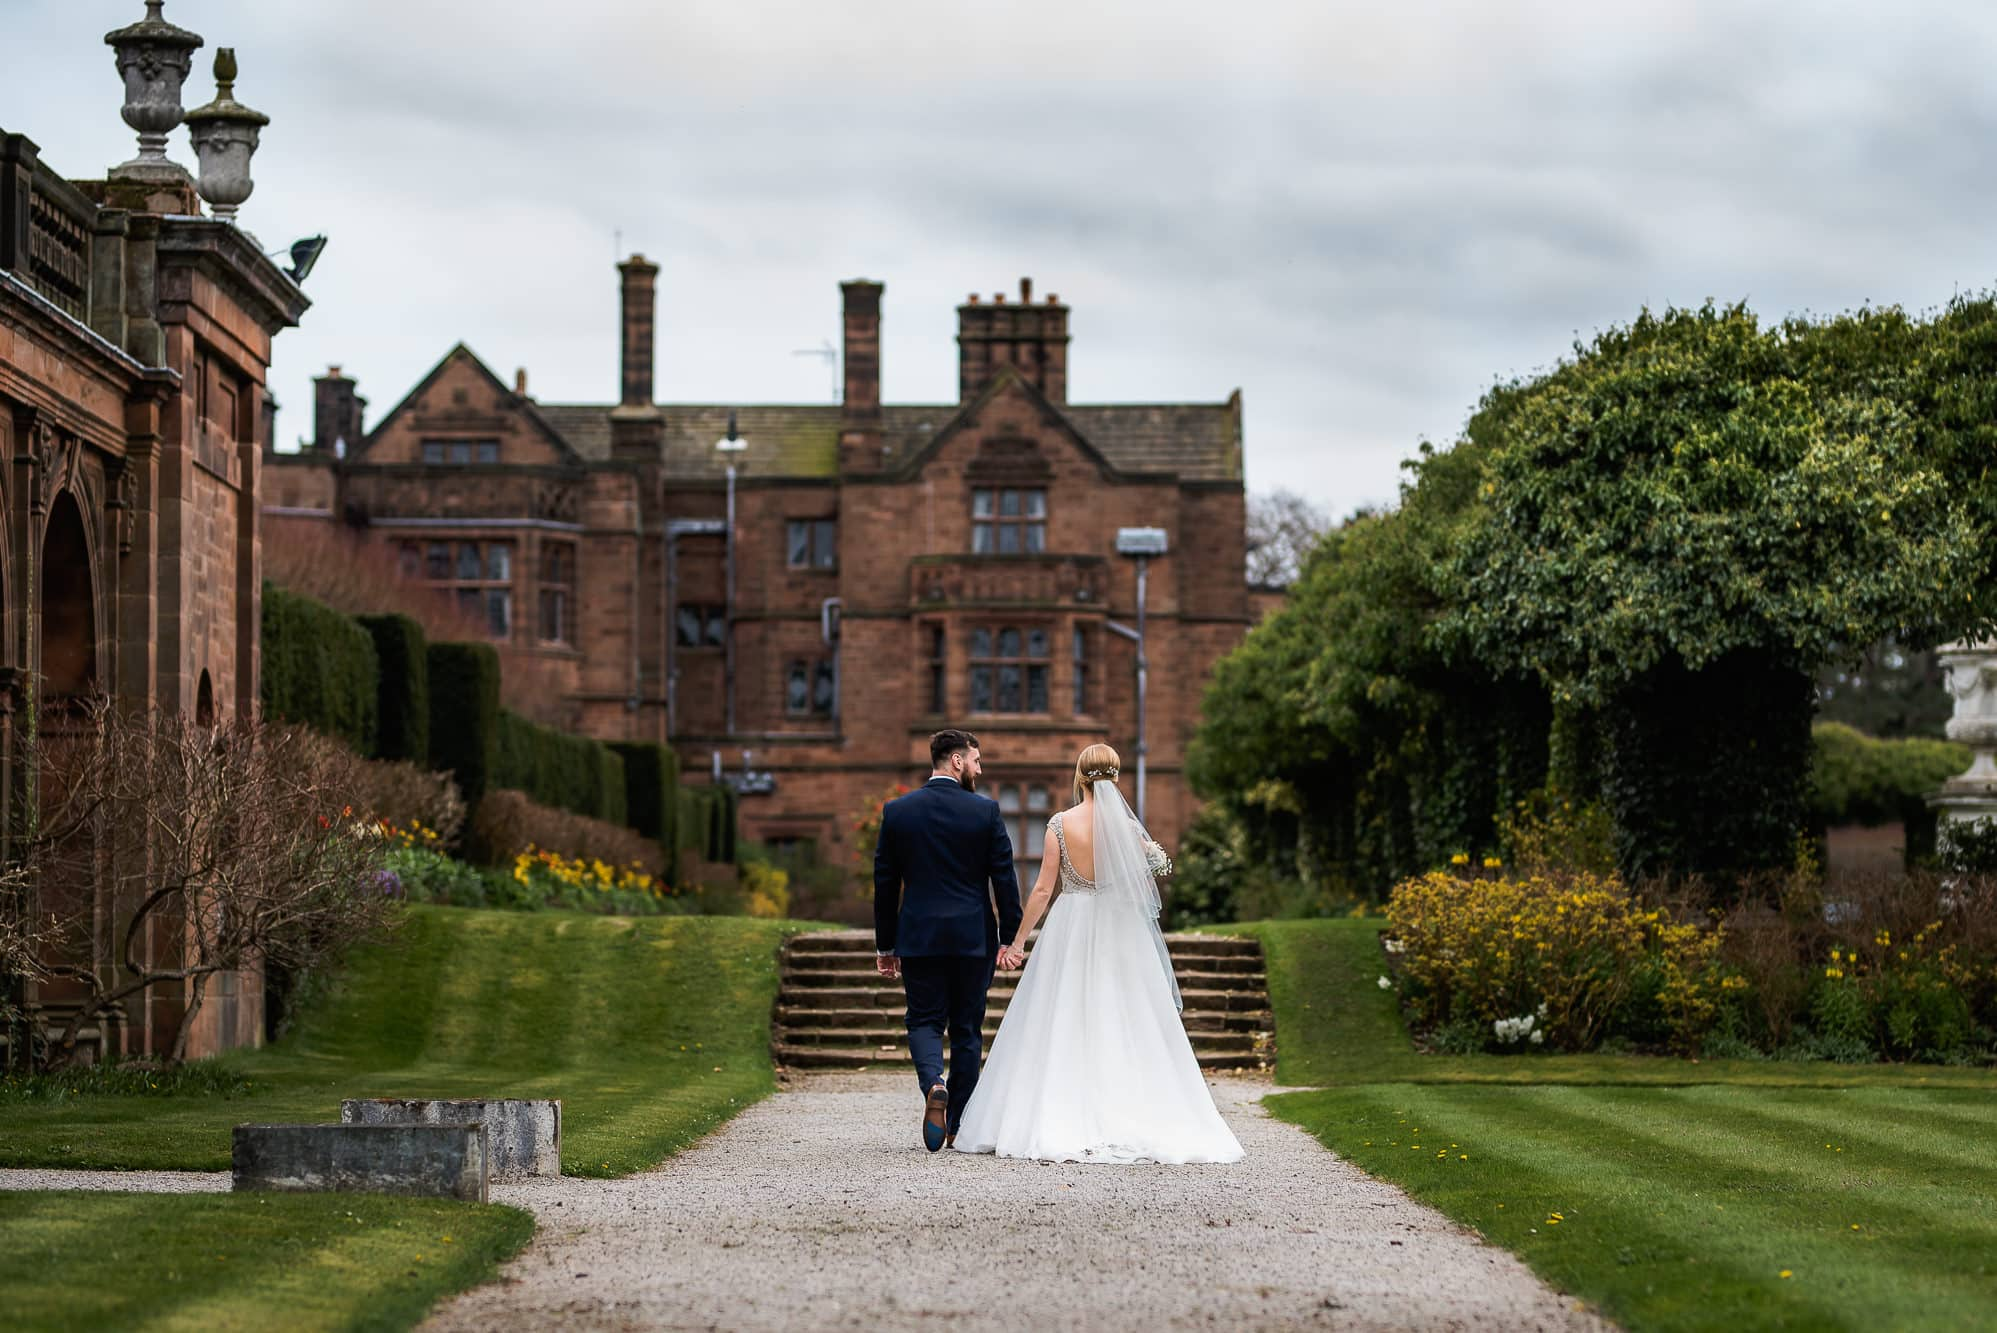 Bride and groom walking towards the manor